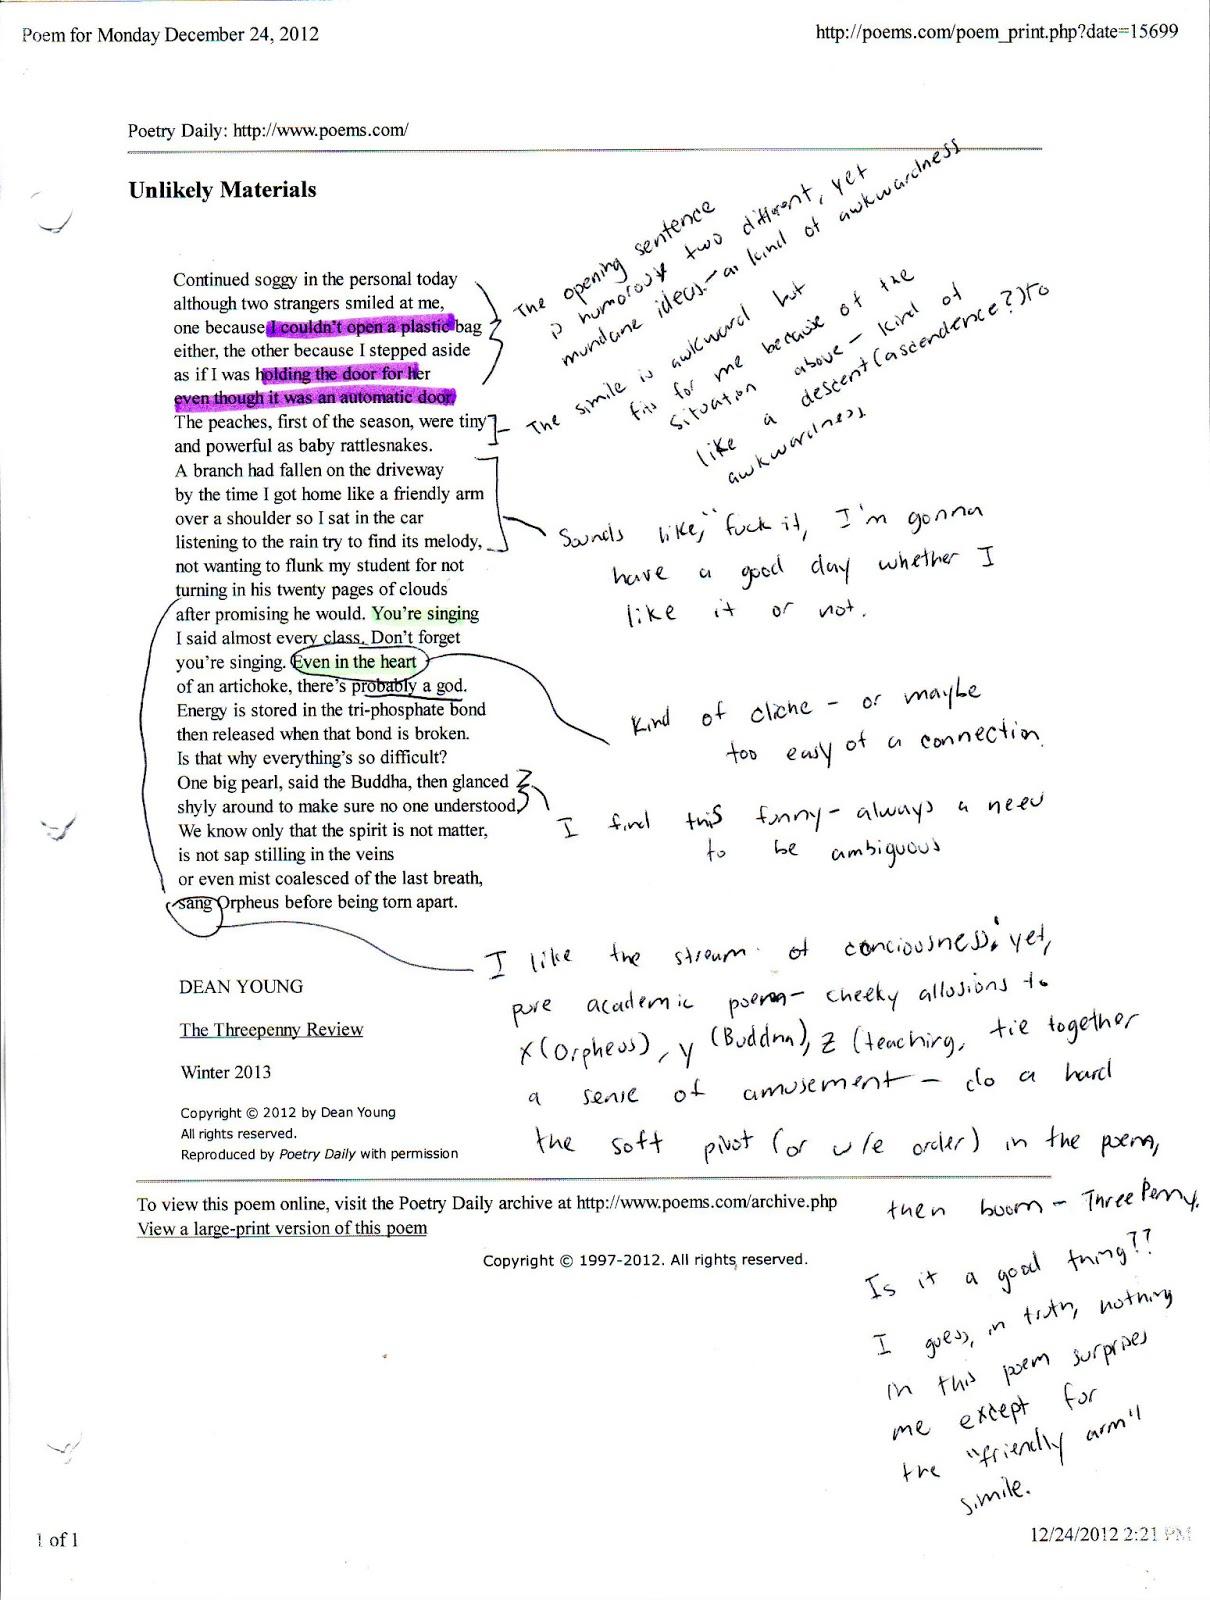 gwen harwood essays anthologies faw tasmania literary essay  gwen harwood critical study essay related posts to gwen harwood critical study essay